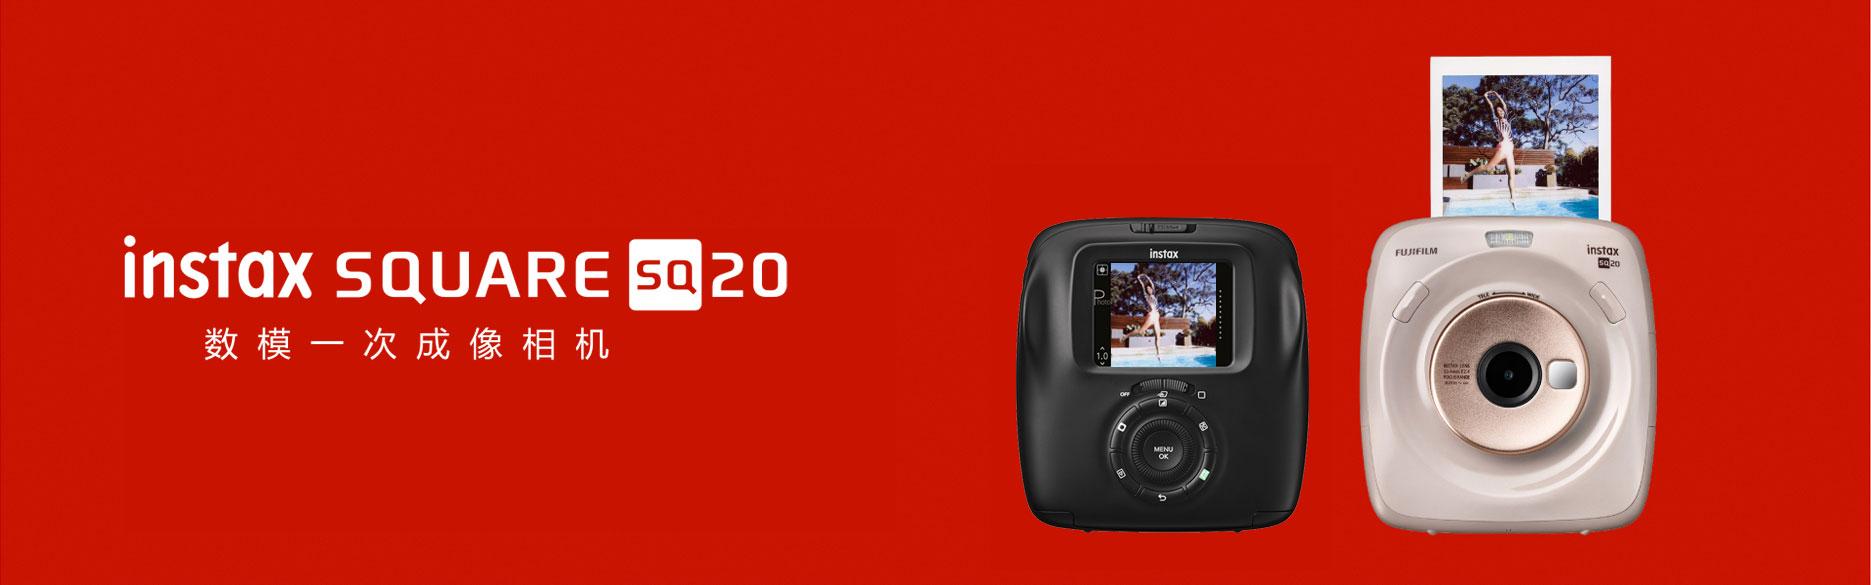 instax SQUARE SQ20,富士instax SQUARE SQ20数模一次成像相机,SQ20相机